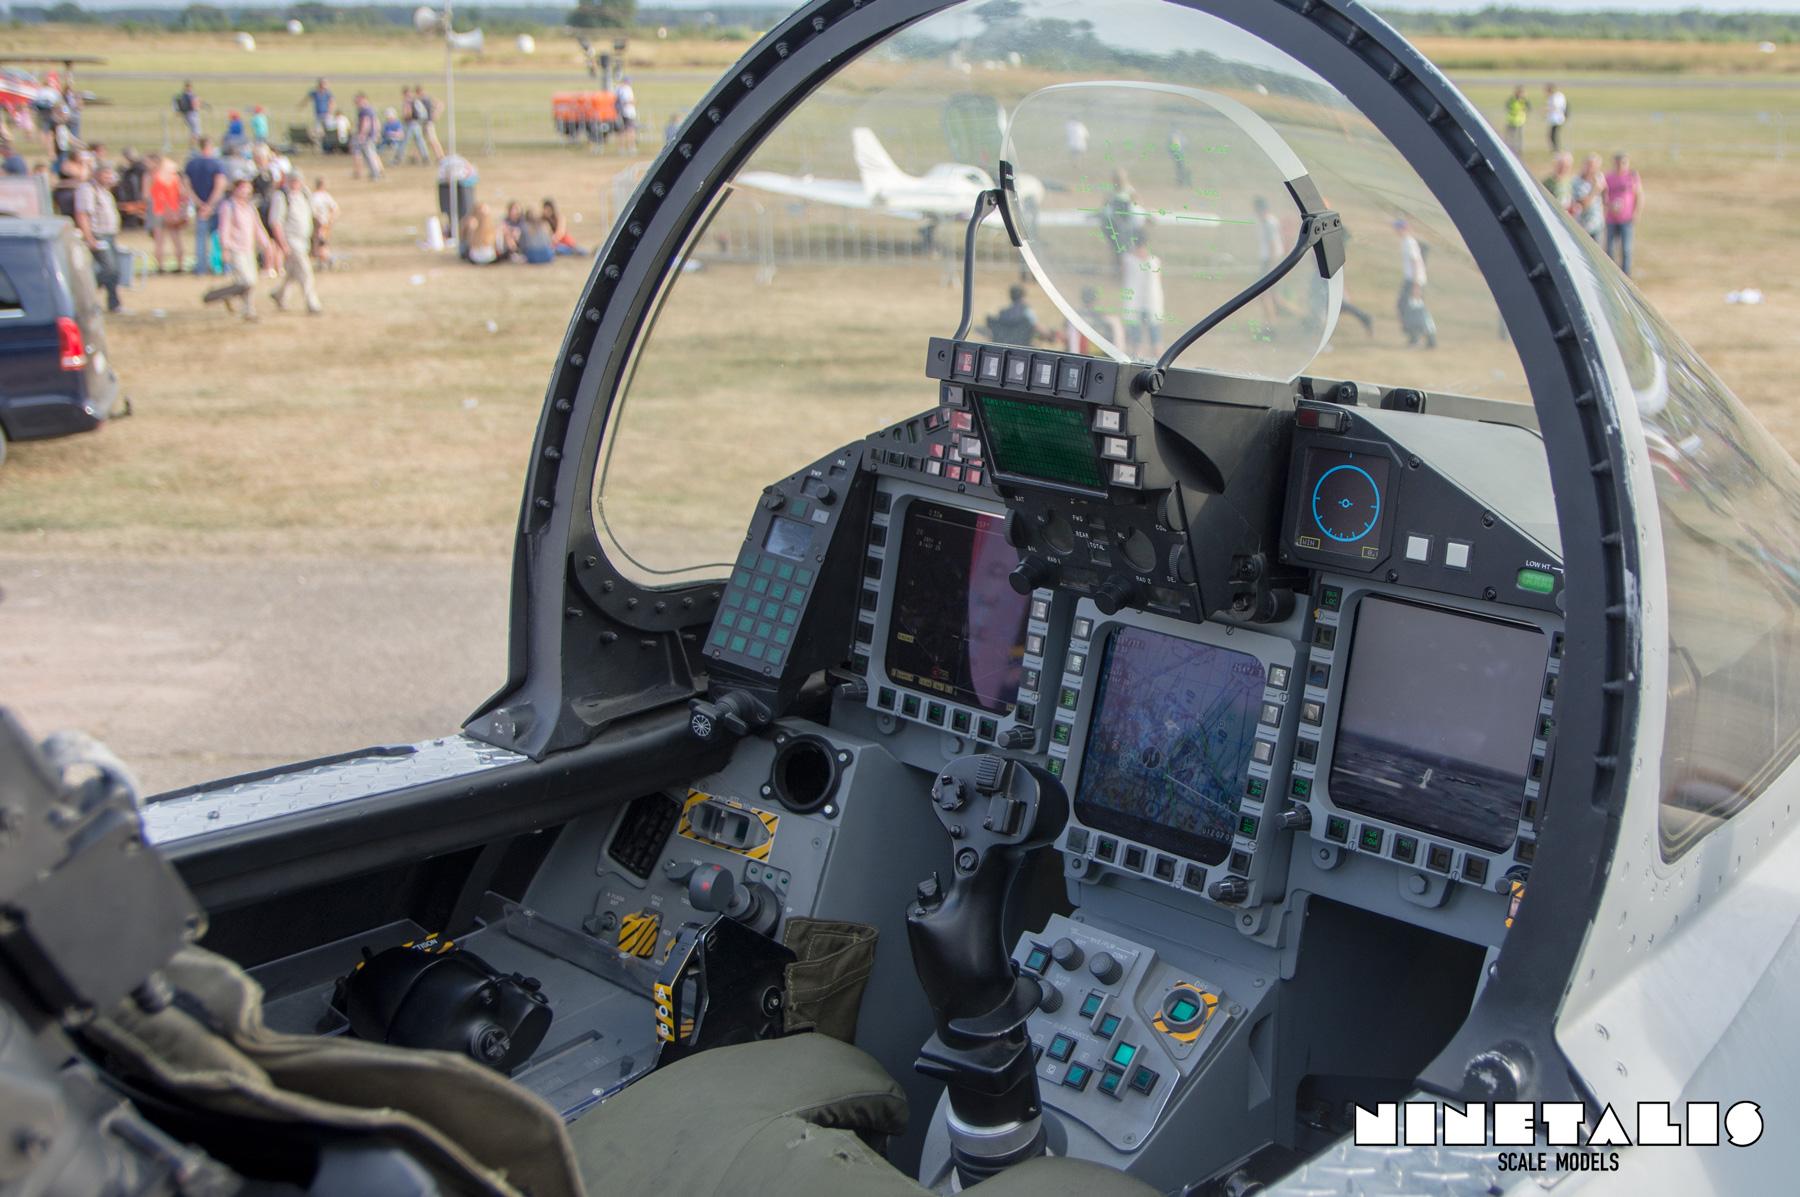 Eurofighter Typhoon cockpit – Ninetalis scale models